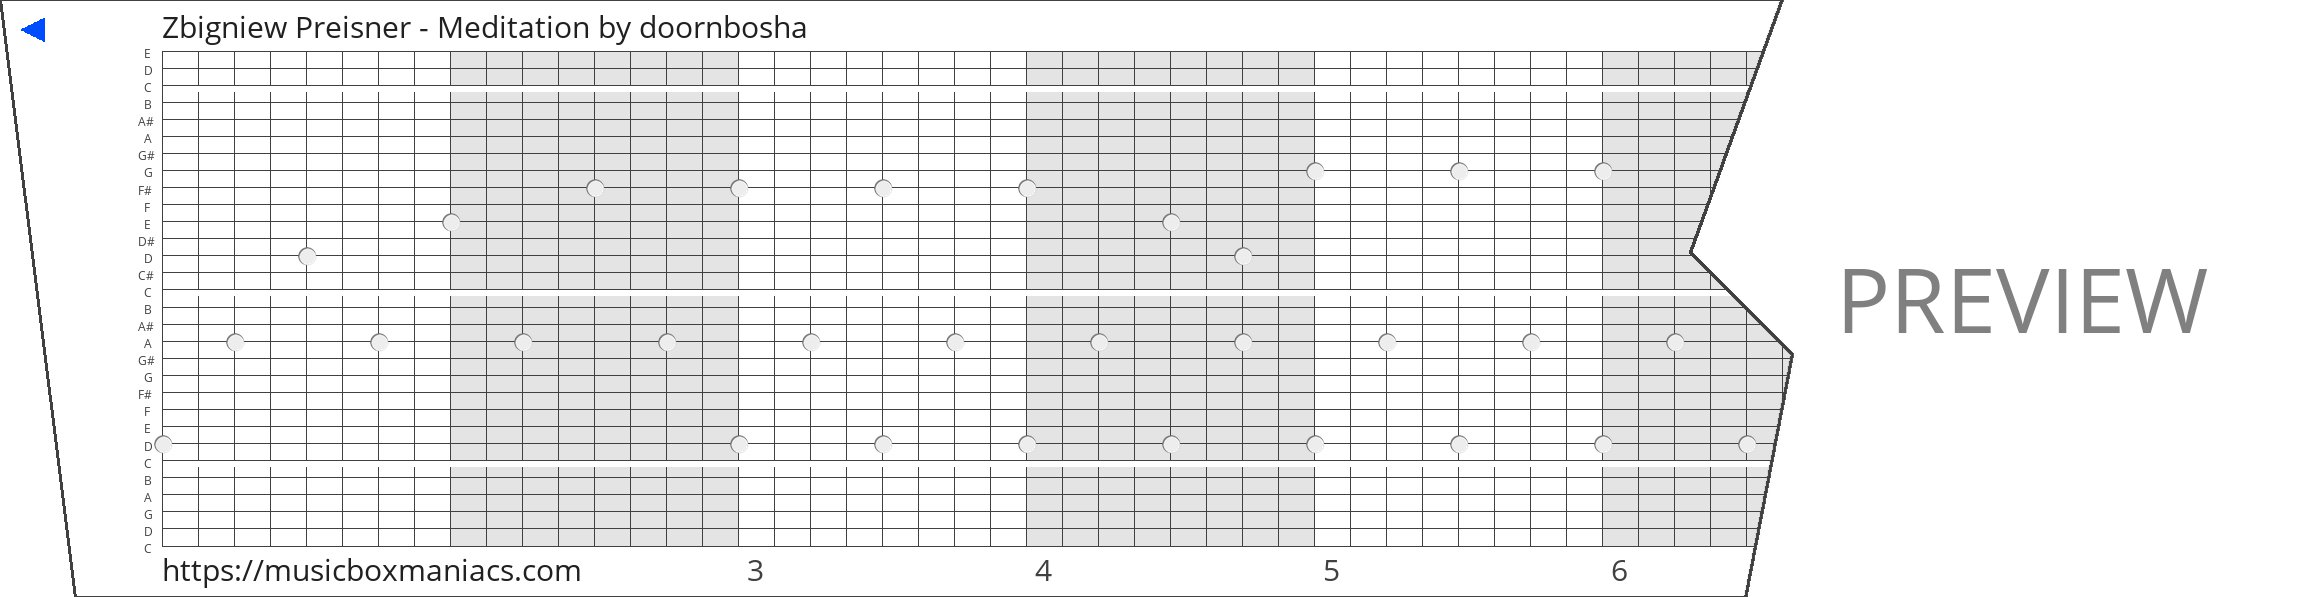 Zbigniew Preisner - Meditation 30 note music box paper strip